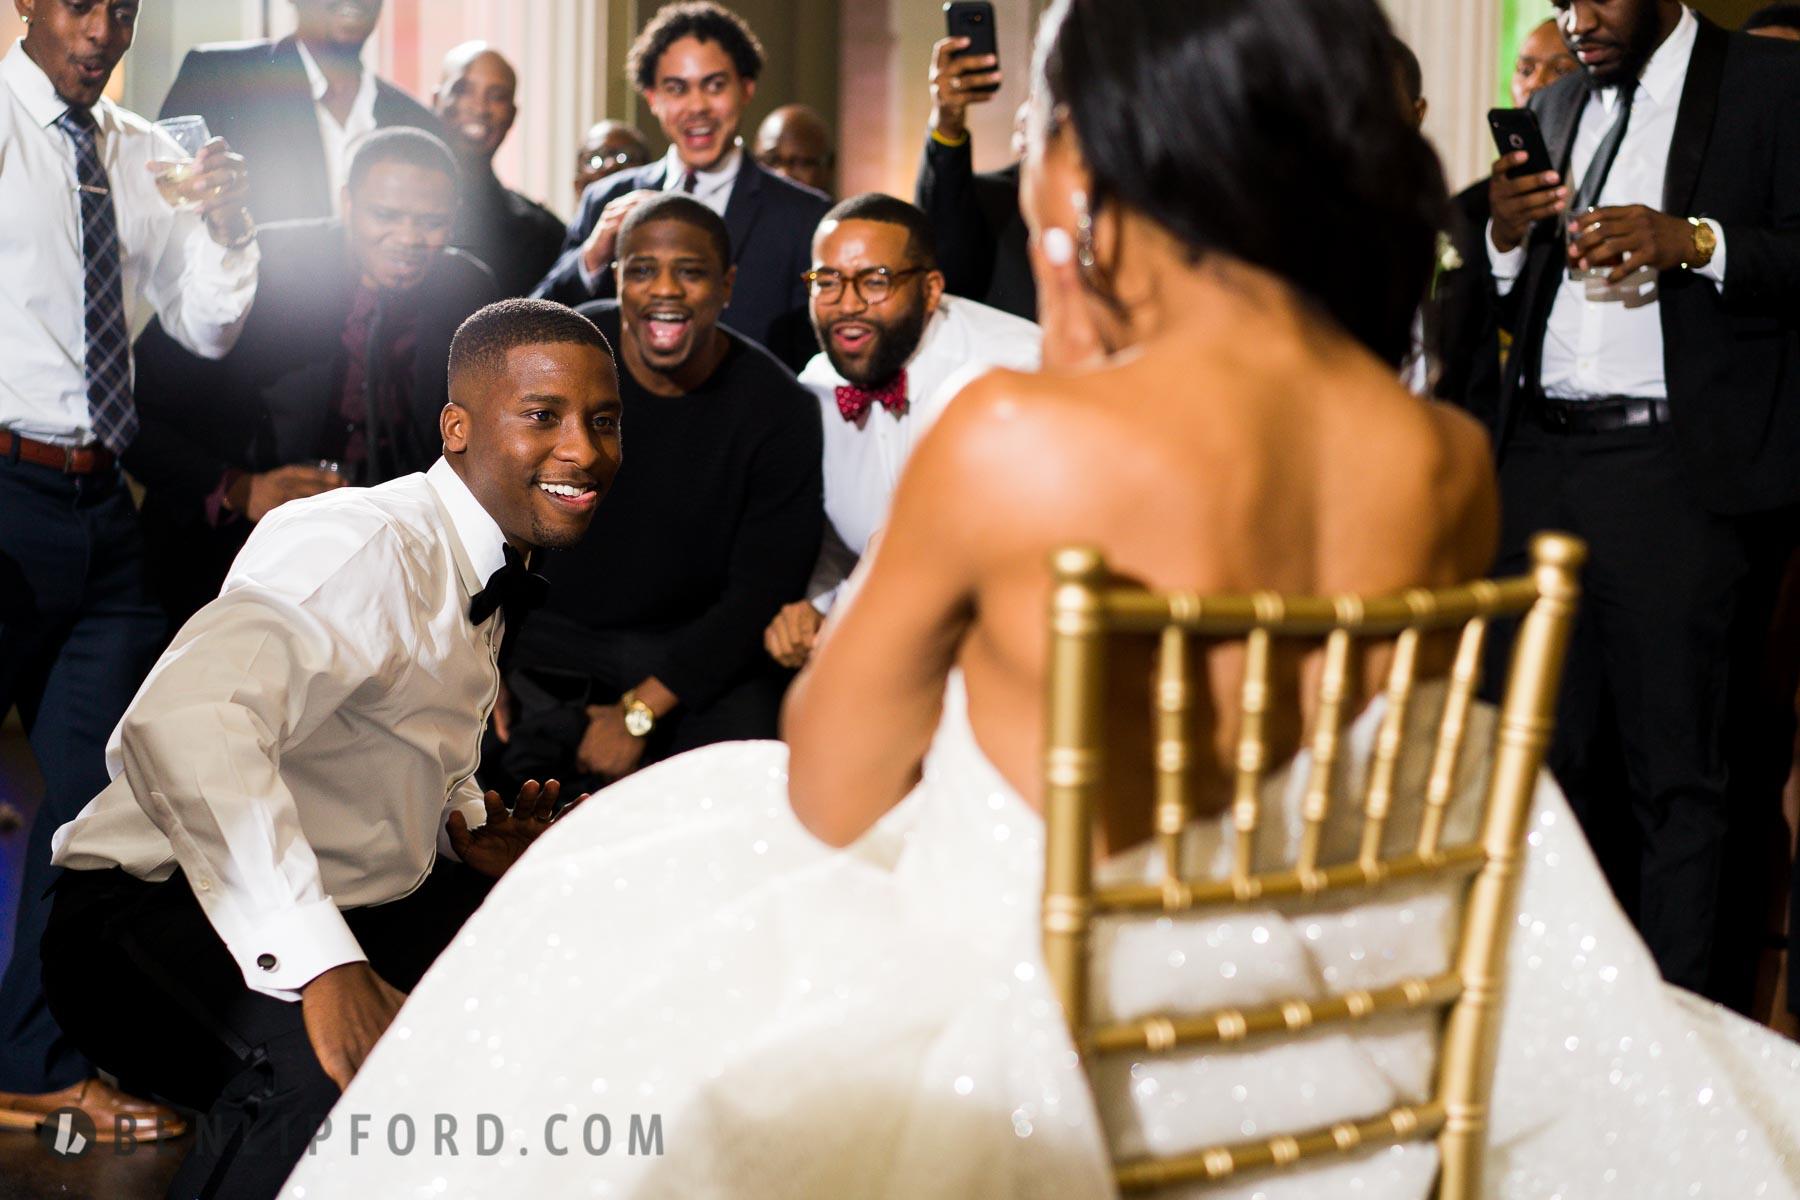 Cameron Jordan Wedding (20 of 24).jpg